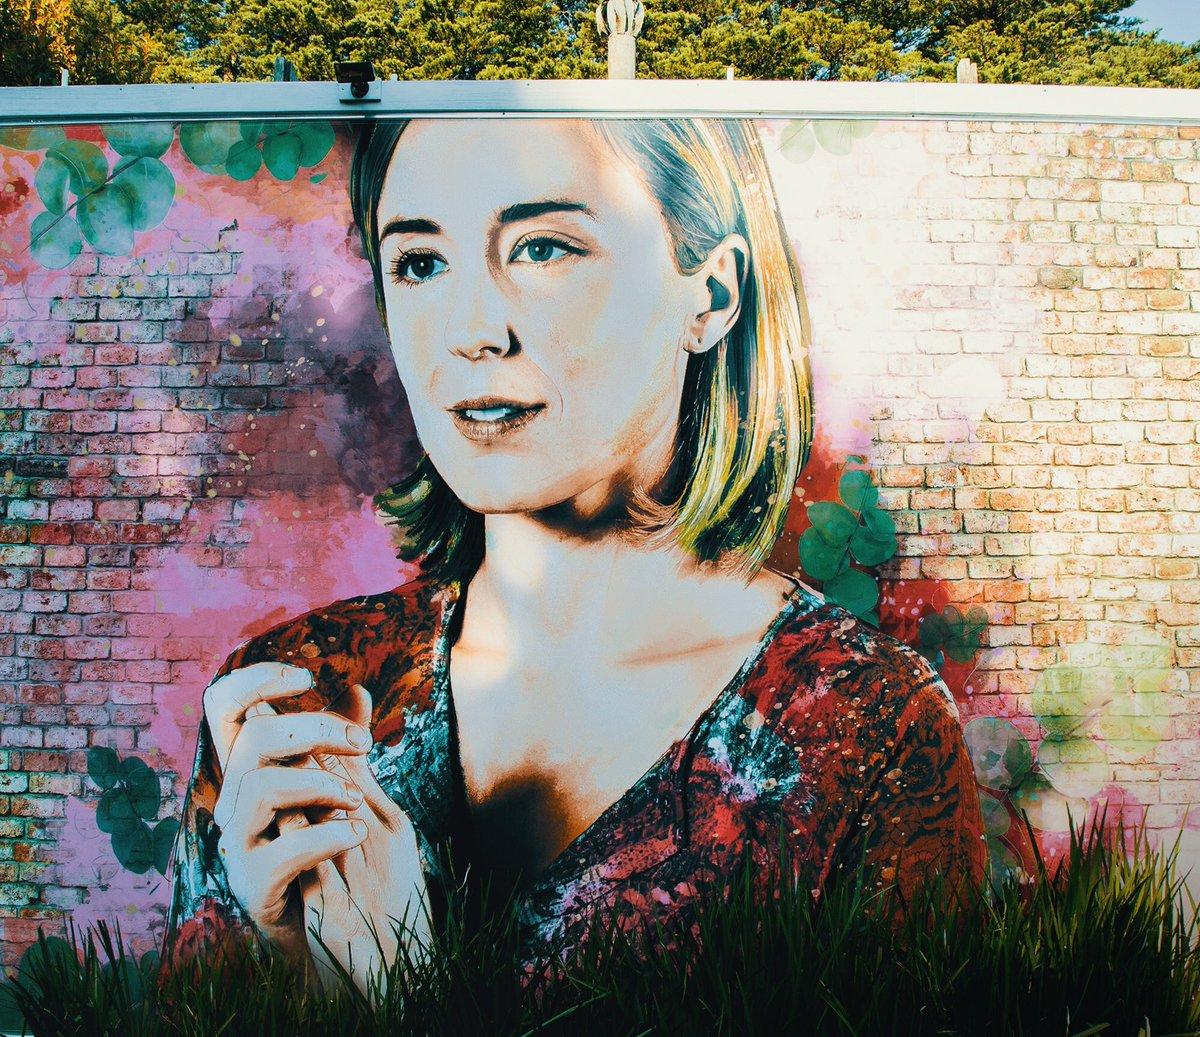 This mural depicting my dead good friend Sonya is based on my bedroom wall. #TrueStory #Neighbours<br>http://pic.twitter.com/Gb1ukLBqFc